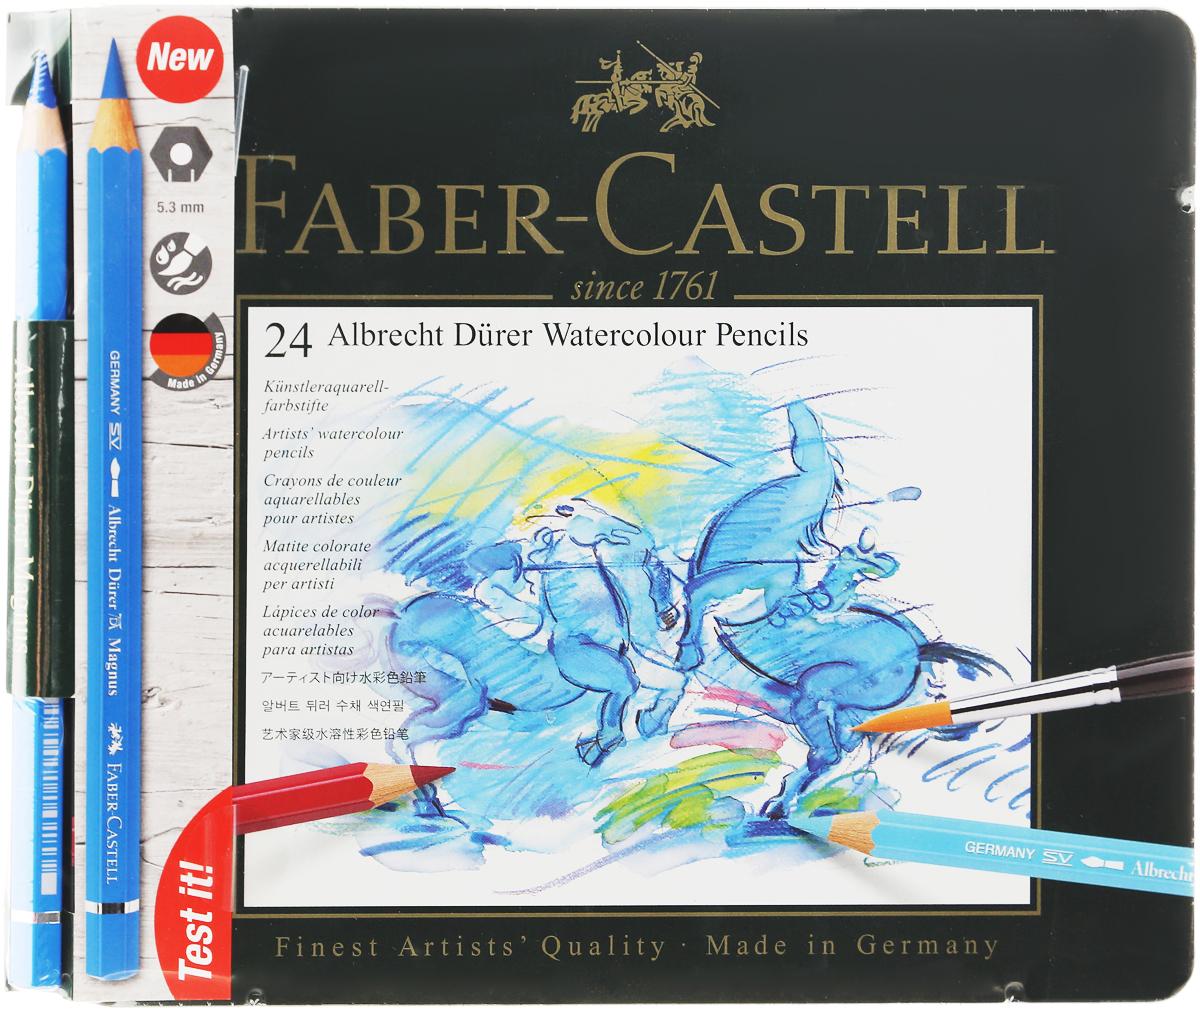 Faber-Castell Акварельные карандаши Albrecht Durer 24 шт карандаши восковые мелки пастель faber castell карандаши акварельные albrecht durer 24 цвета